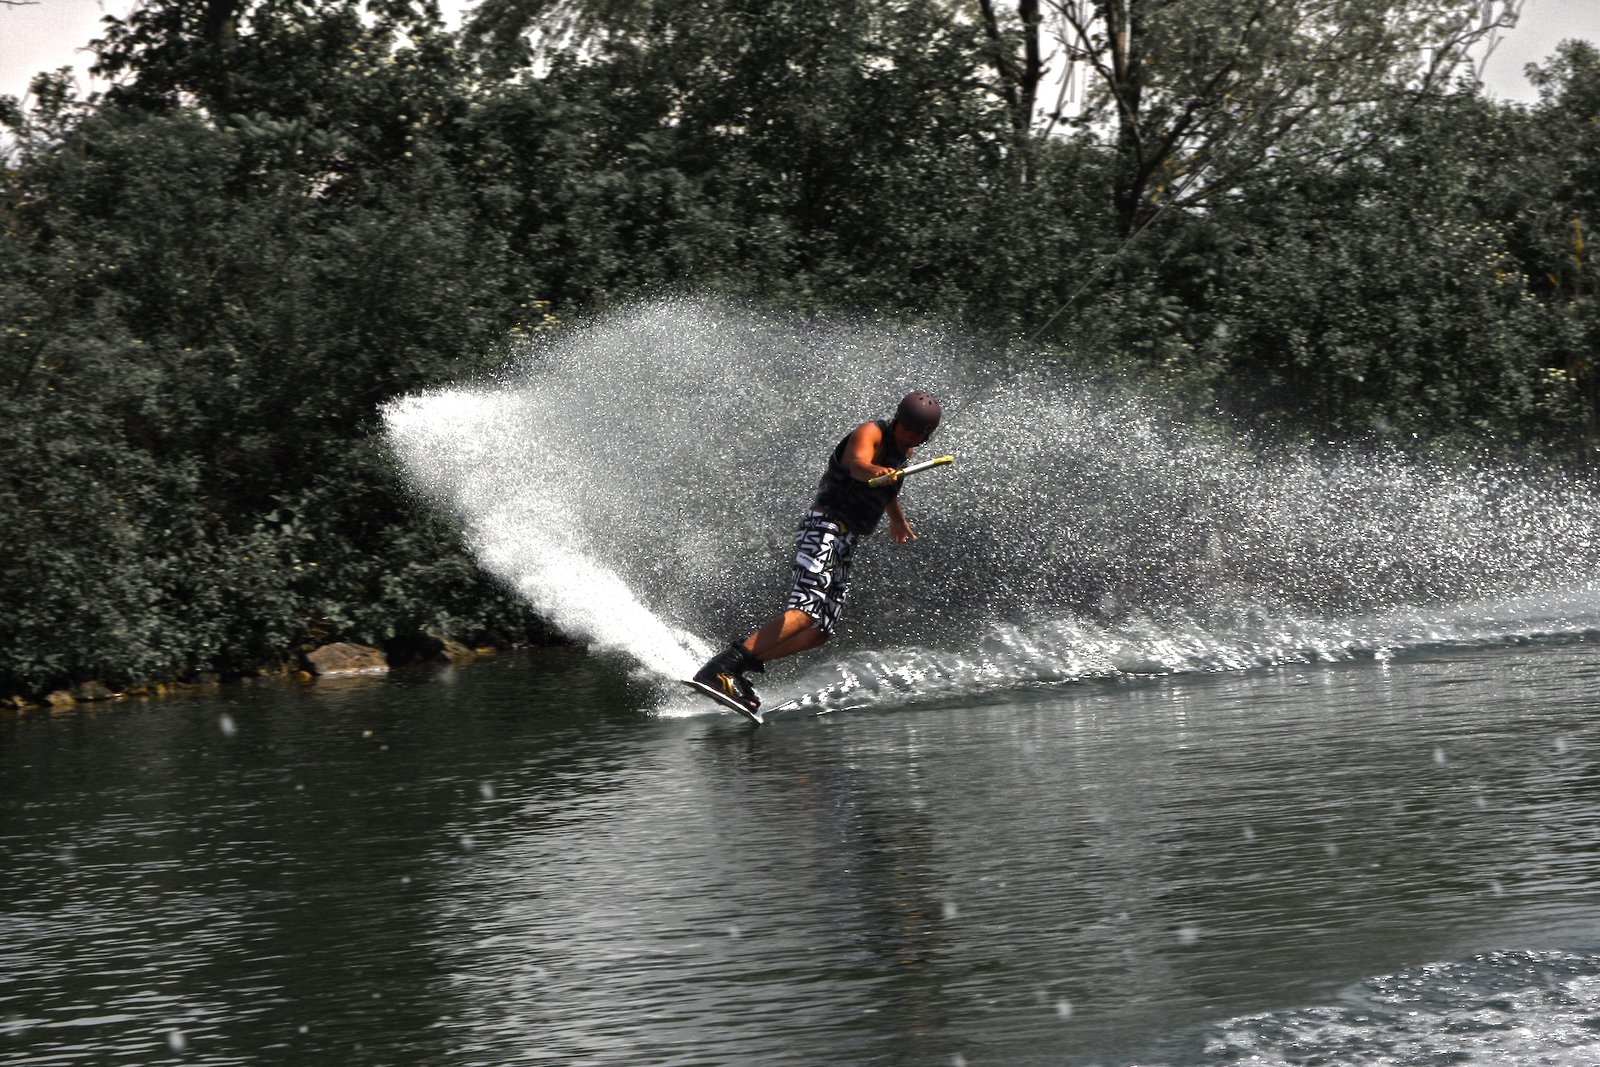 Wakeboard sesh